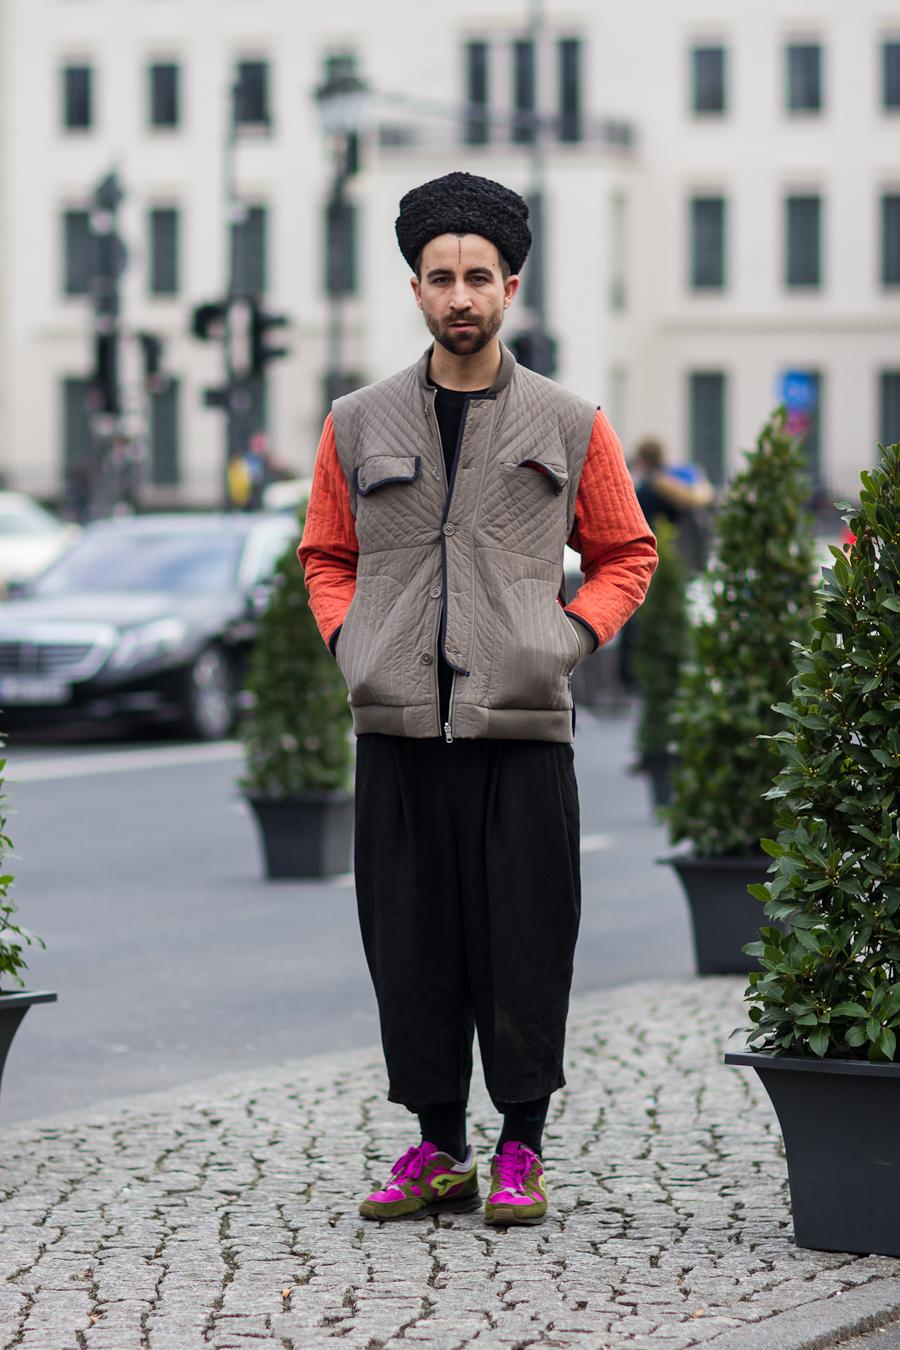 street-style-fashion-blog-innsbruck-berlin-fashion-week-david-dandy-diary